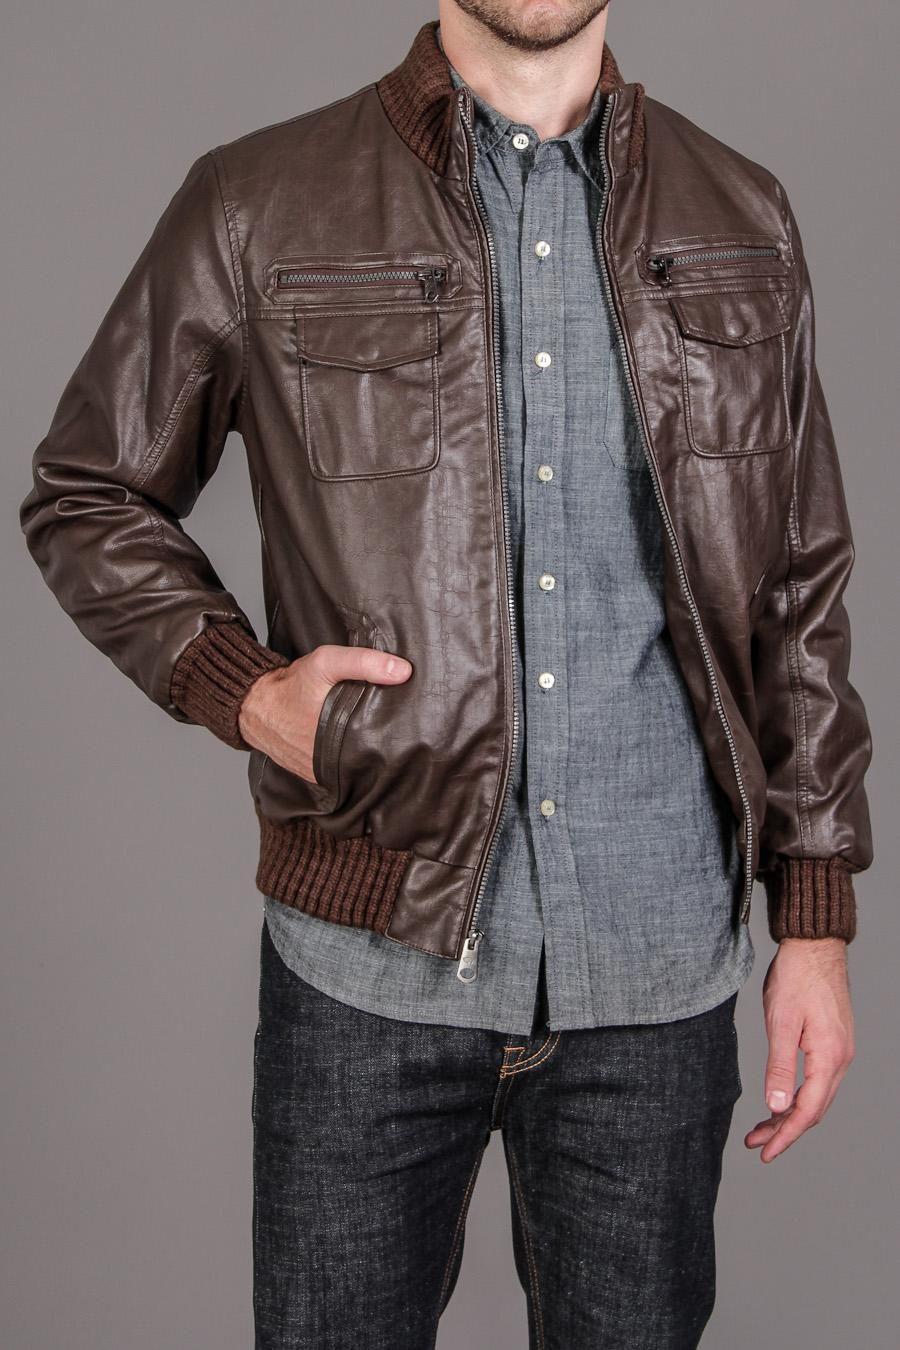 Buffalo David Bitton Bomber Jacket With Knit Collar 79 99 Mens Fashion Bomber Jacket Style [ 1350 x 900 Pixel ]